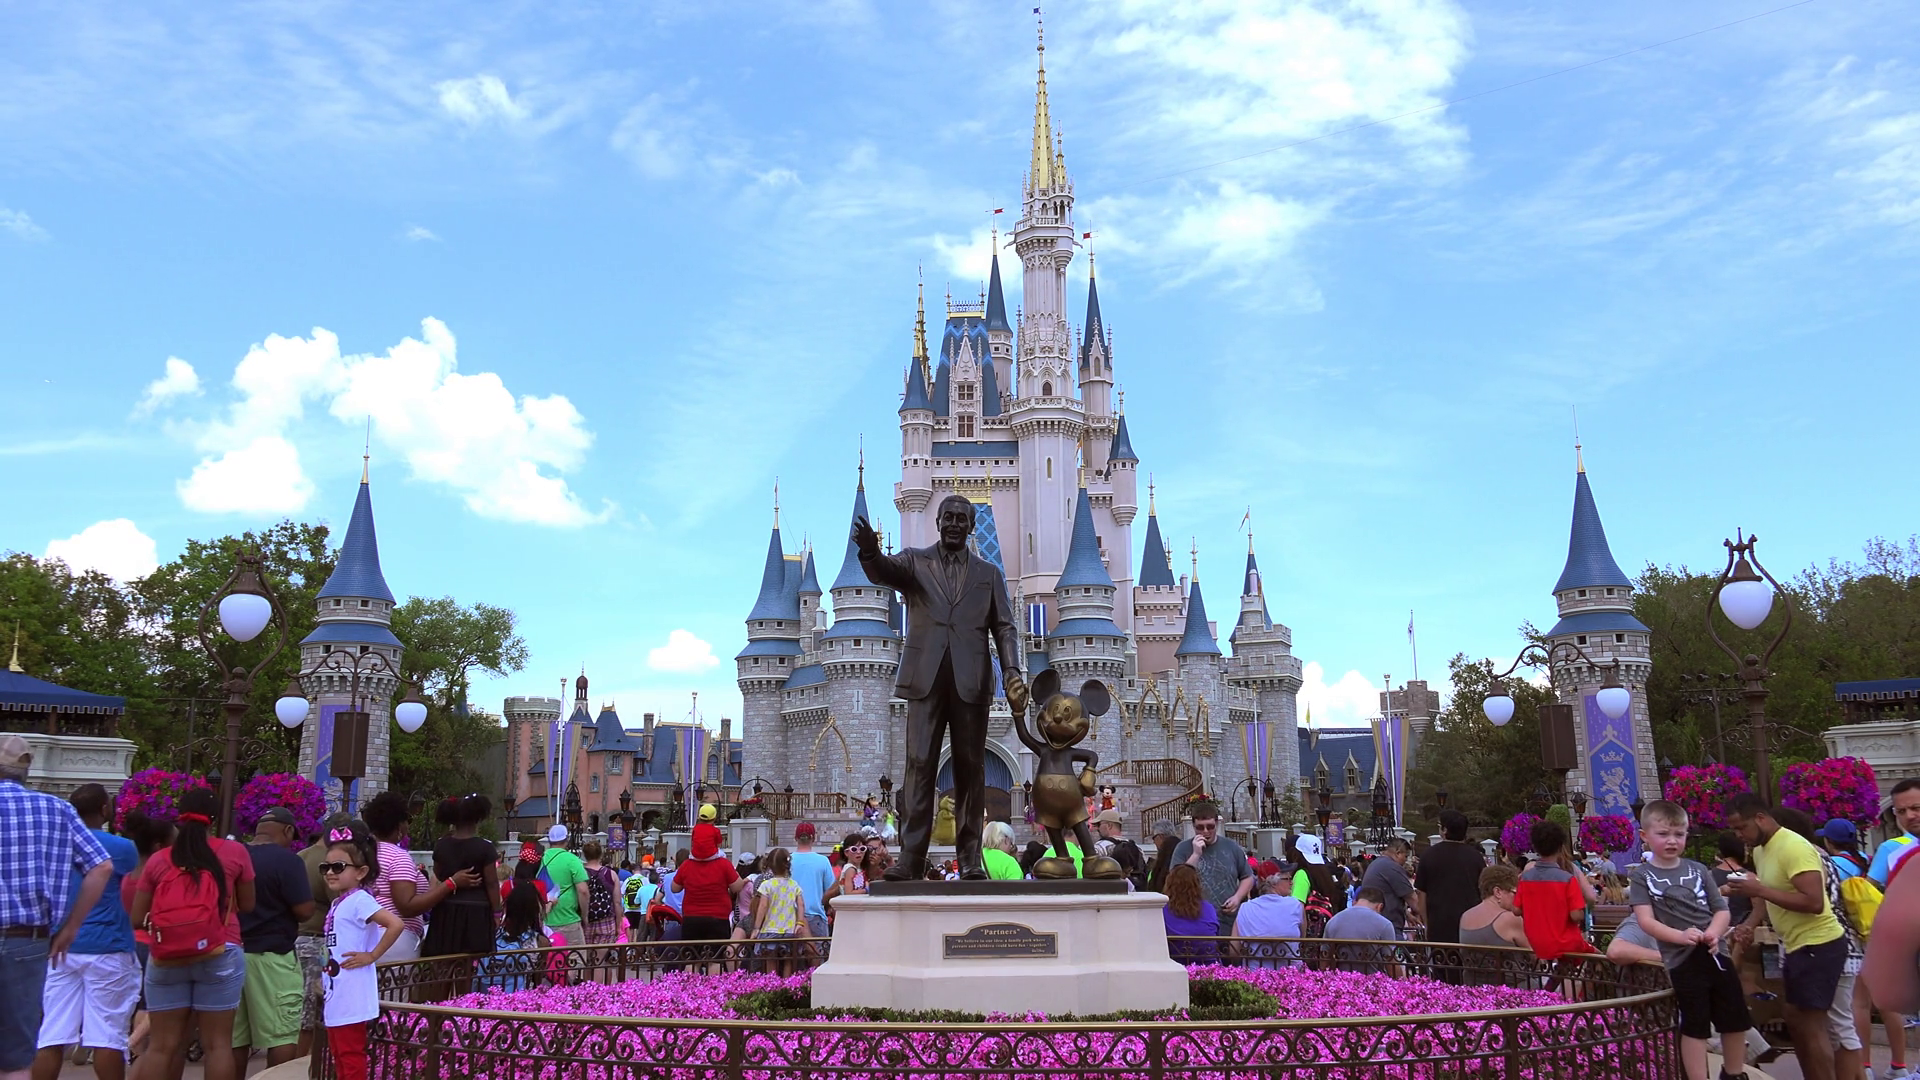 Magic Kingdom Park Disney World Cinderella Castle 2049520 Hd Wallpaper Backgrounds Download